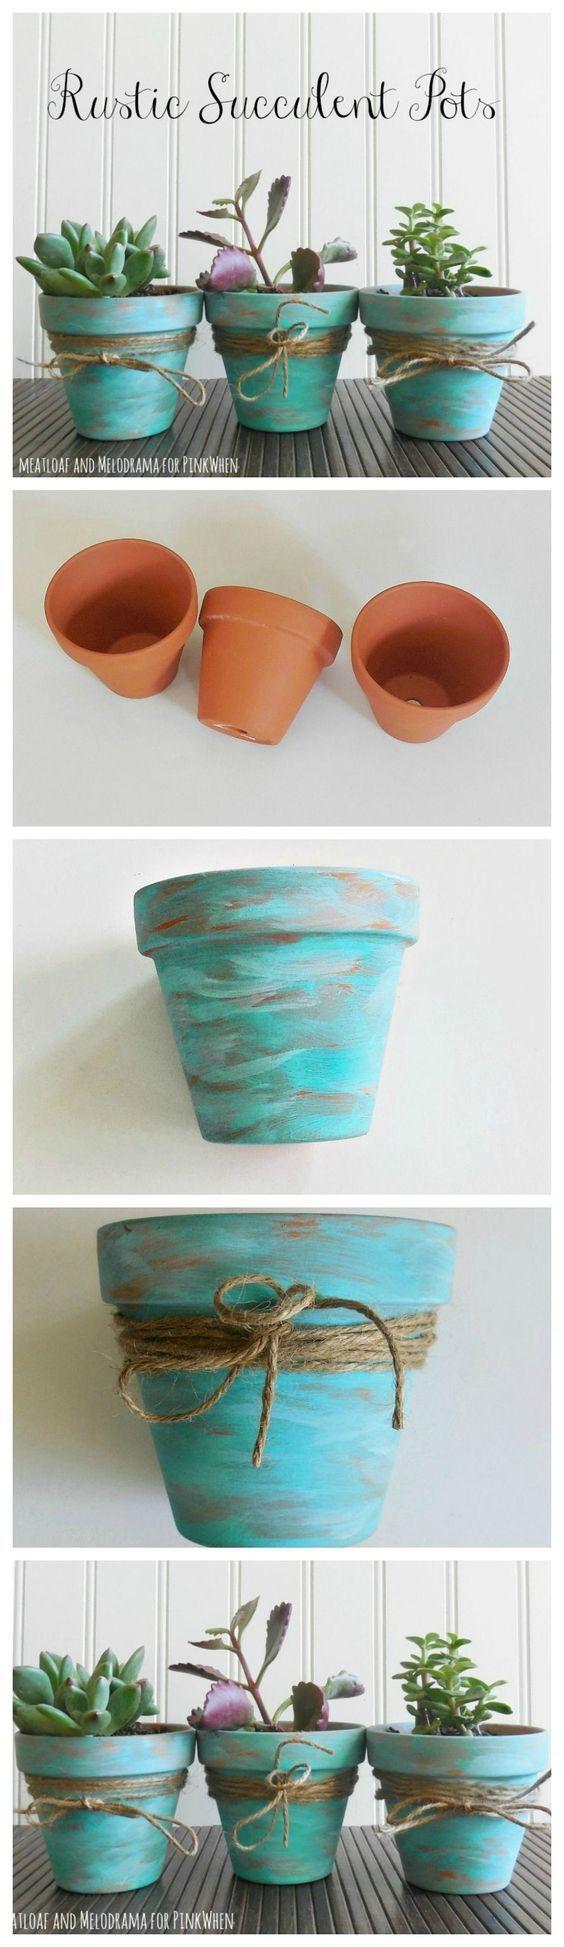 decoraçao vasos de barro